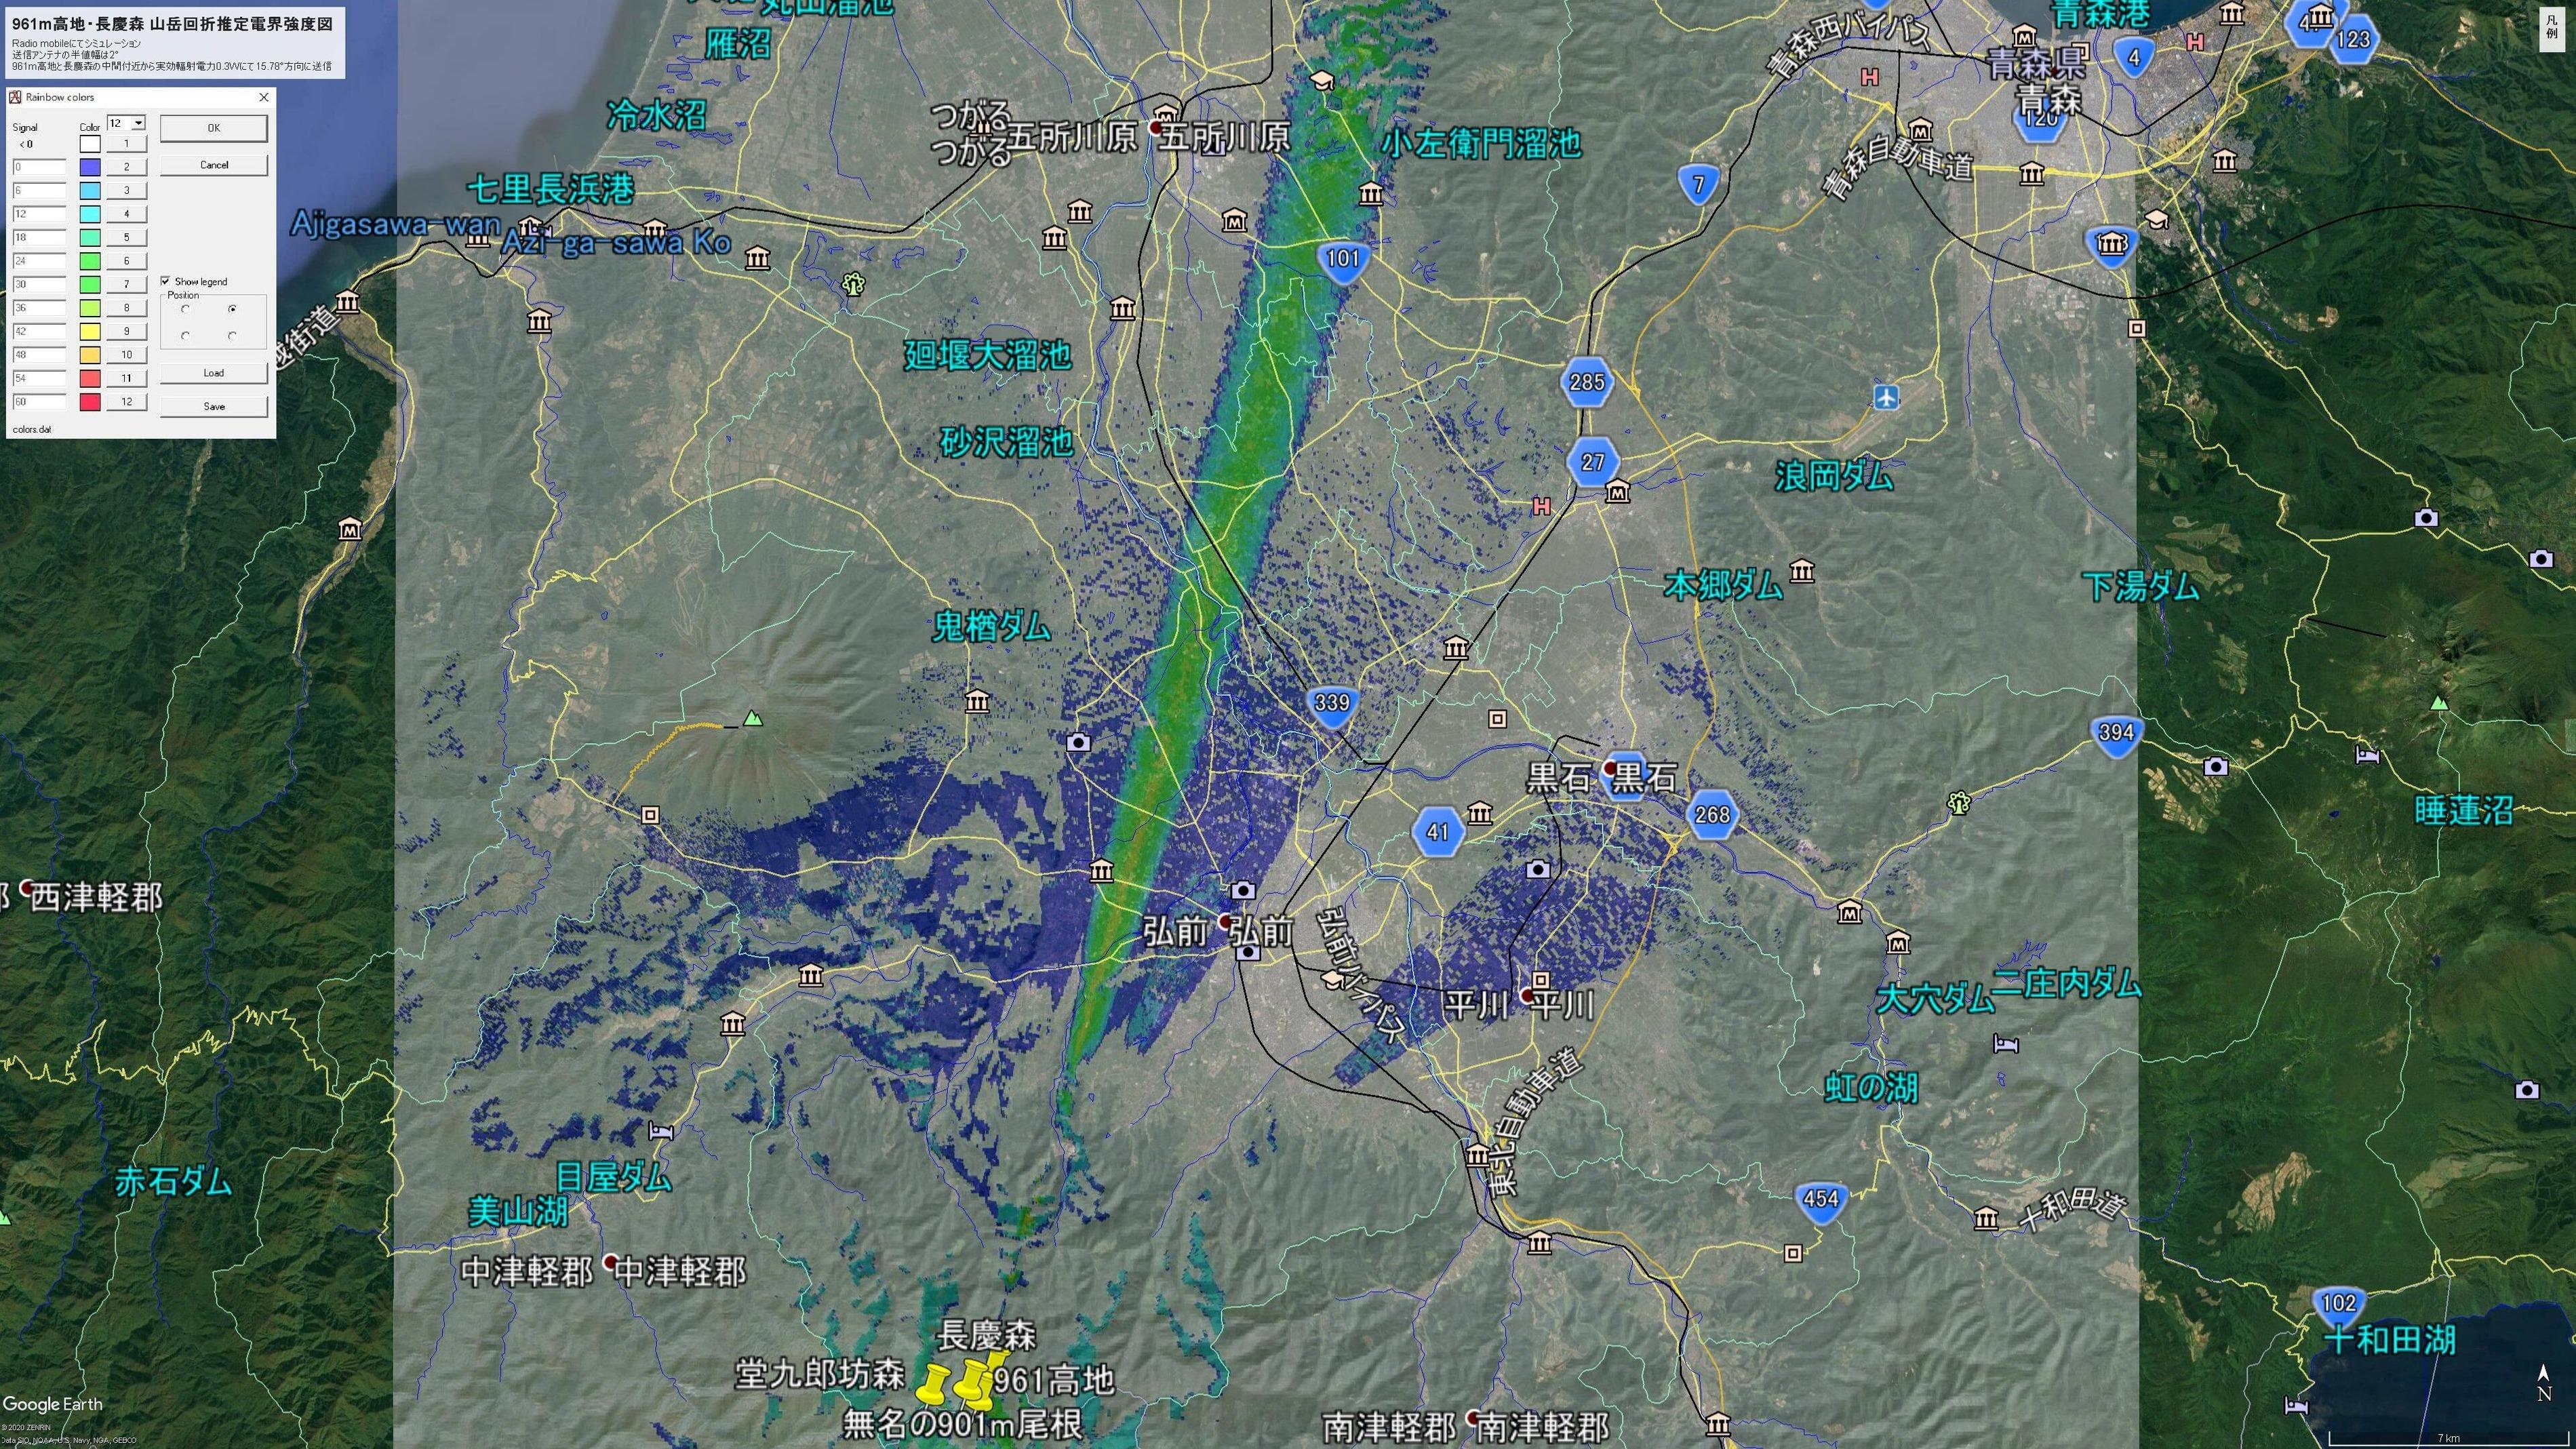 961m高地・長慶森 山岳回折推定電界強度図